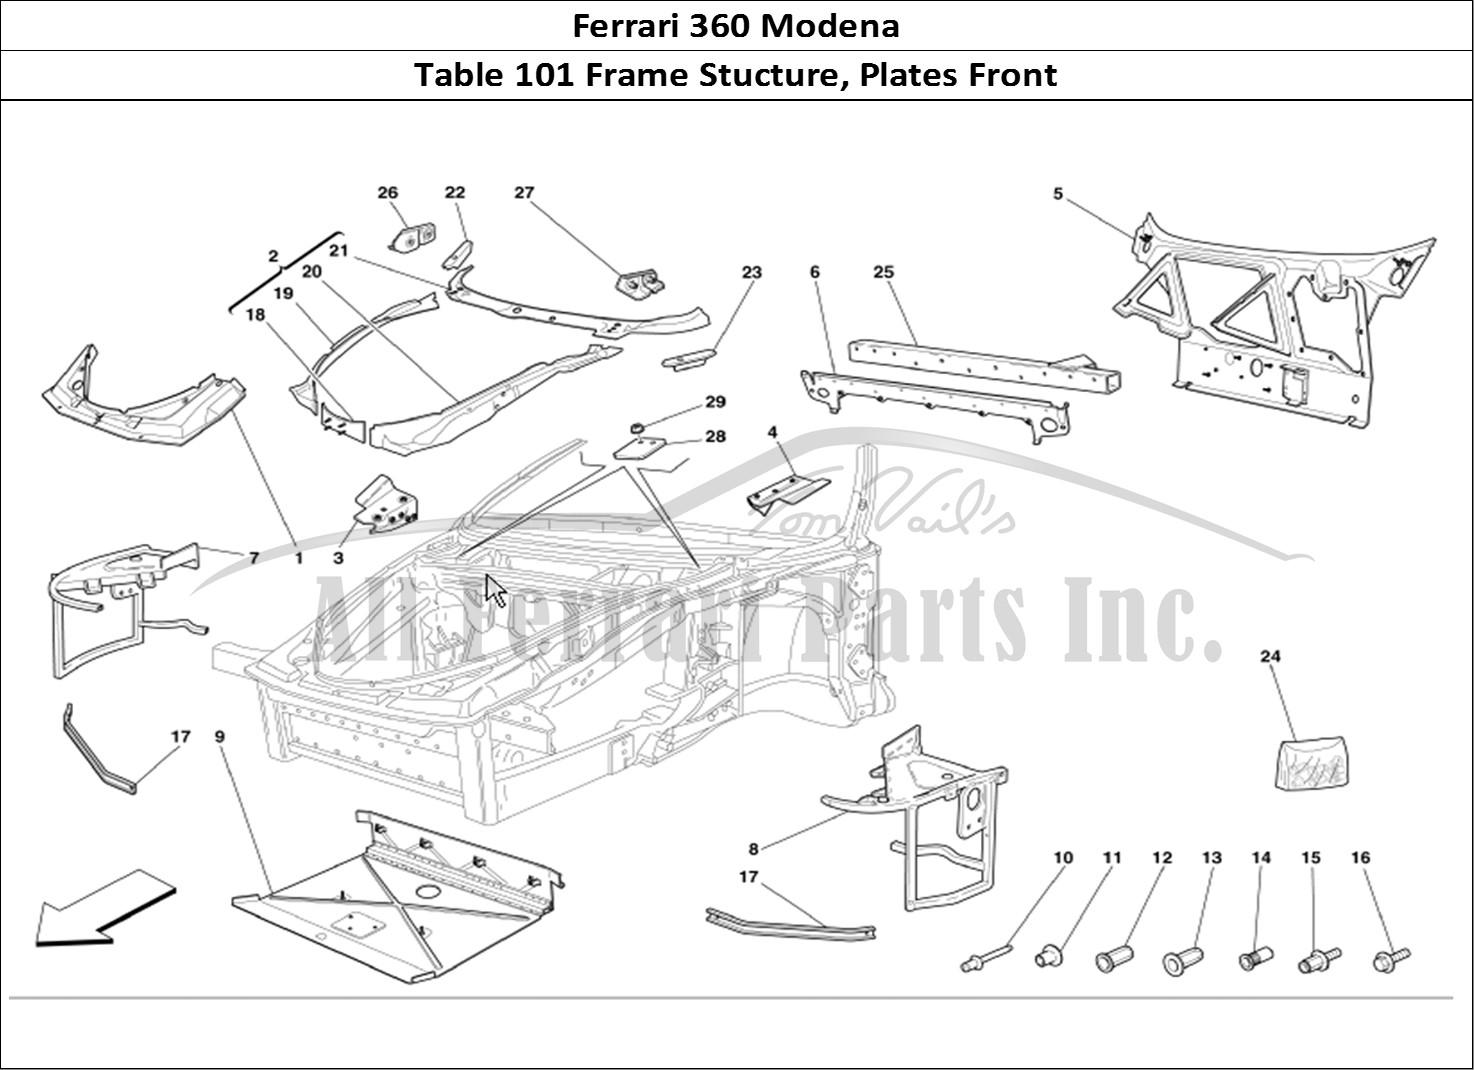 Buy original Ferrari 360 Modena 101 Frame Stucture, Plates